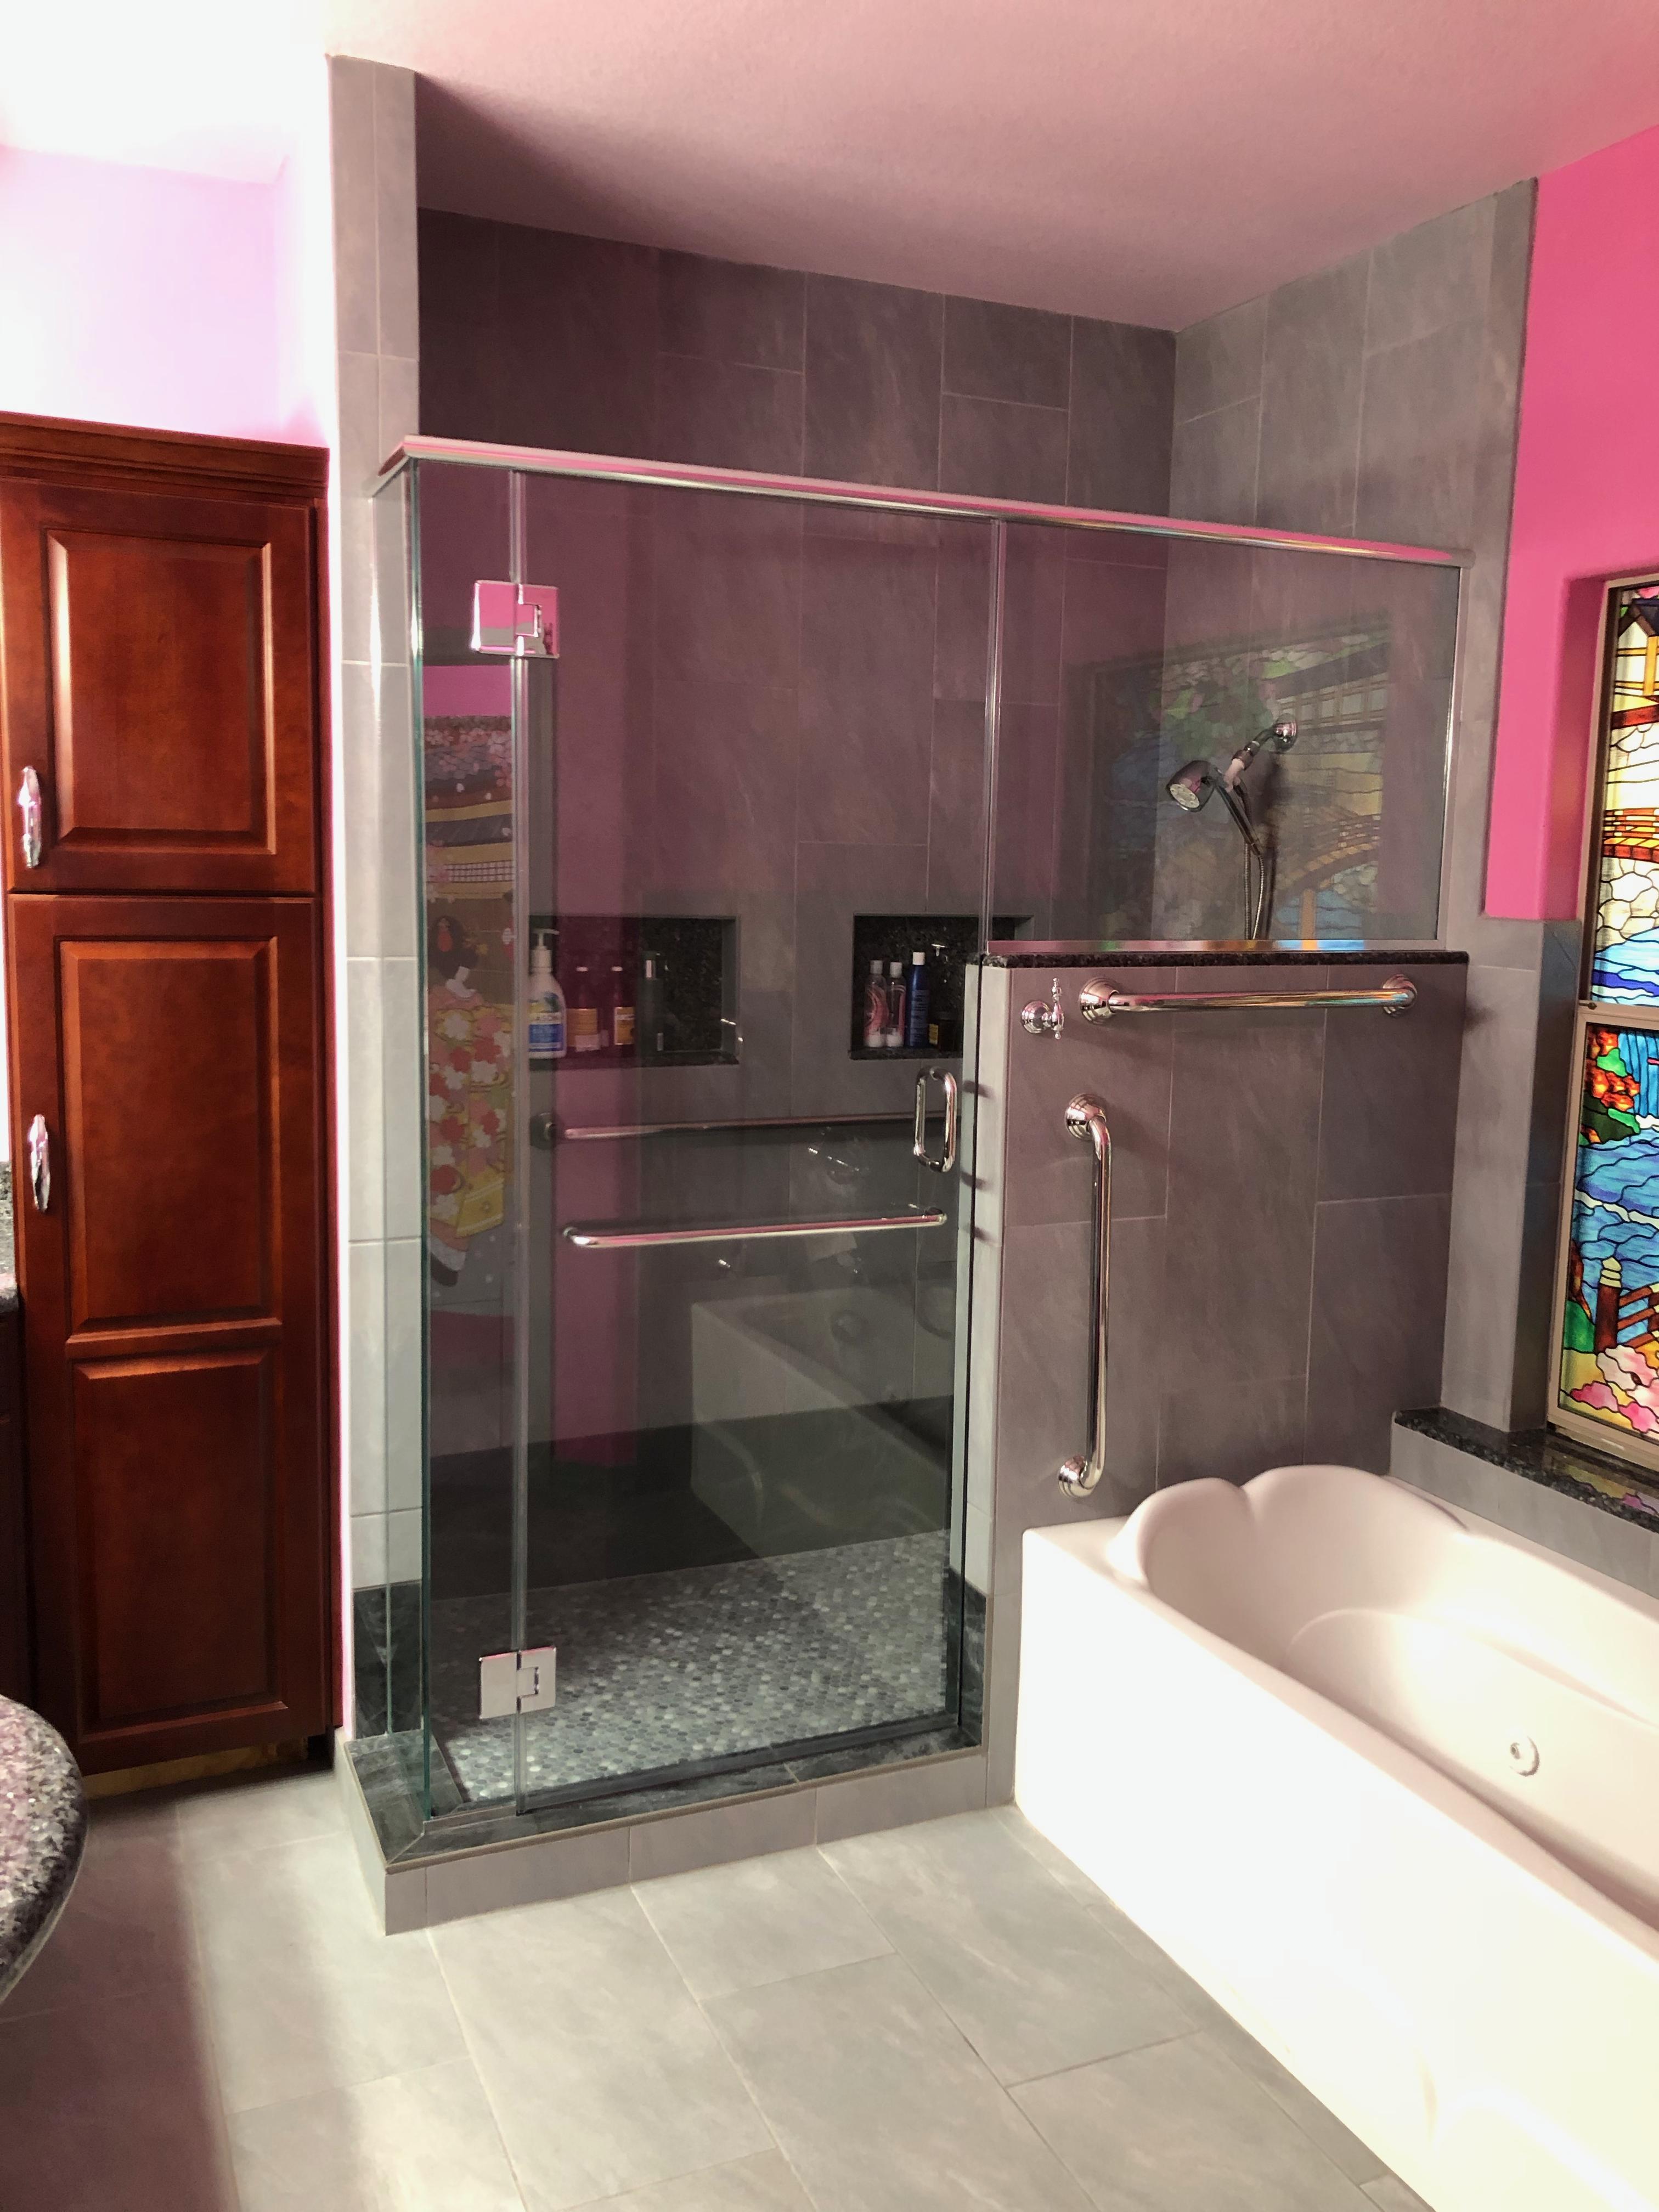 Designer Kitchens Baths Reviews Las Vegas Nv Angie S List